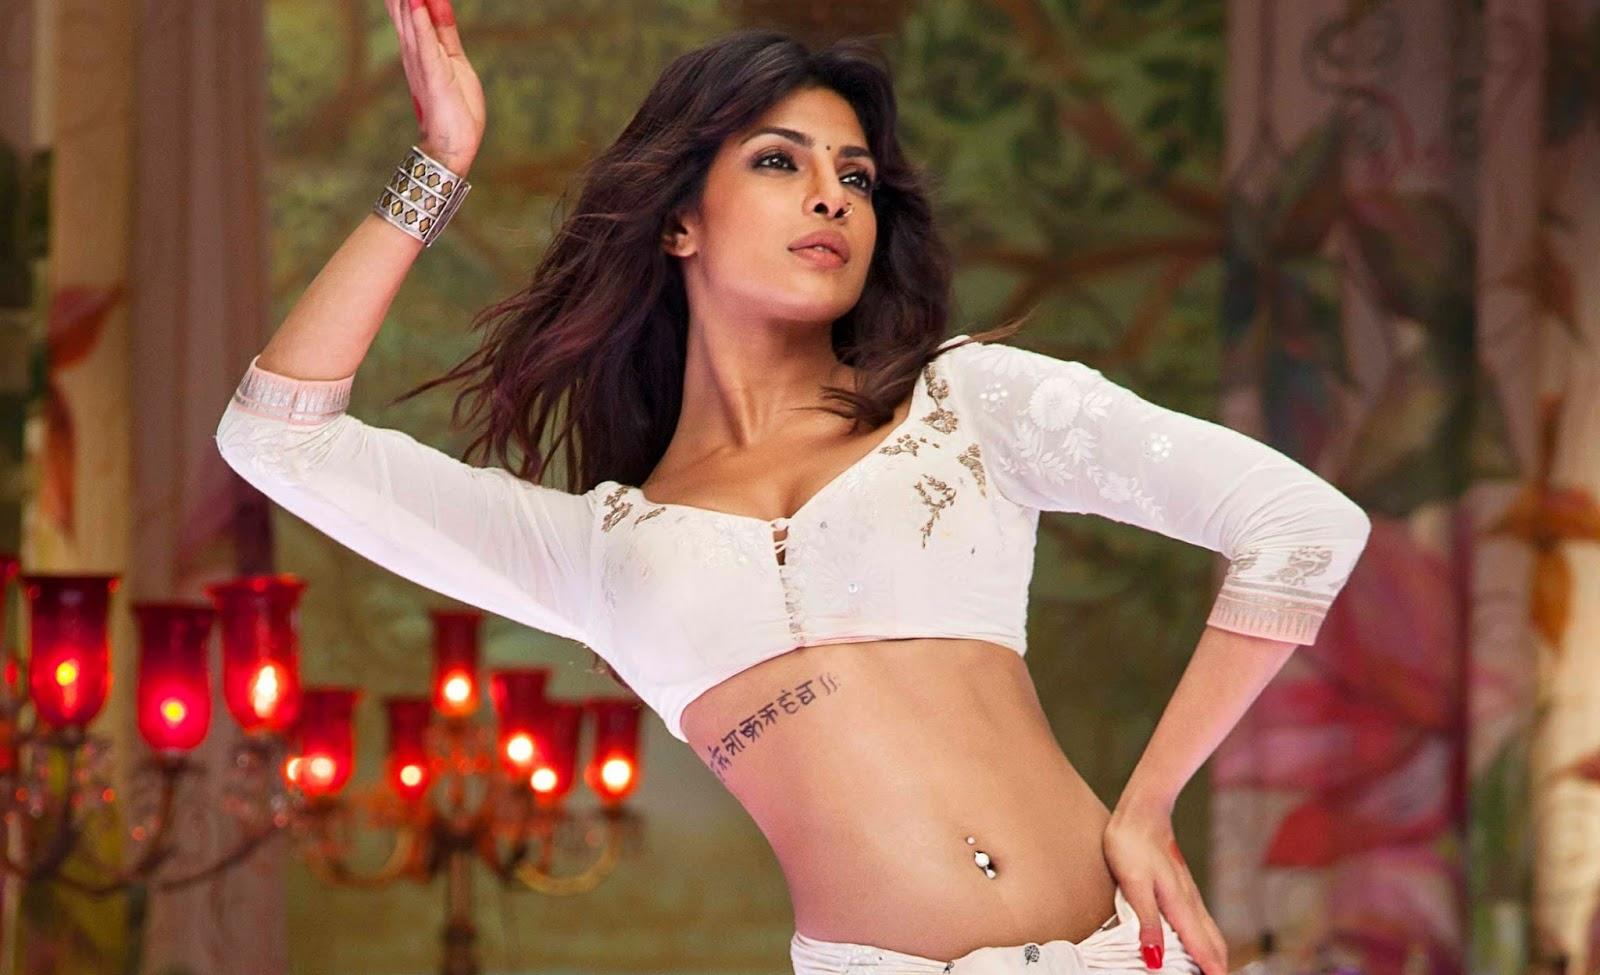 b48dcefa4dddfa See also: Priyanka Chopra Biography, Height, Weight, Wiki, Movie List